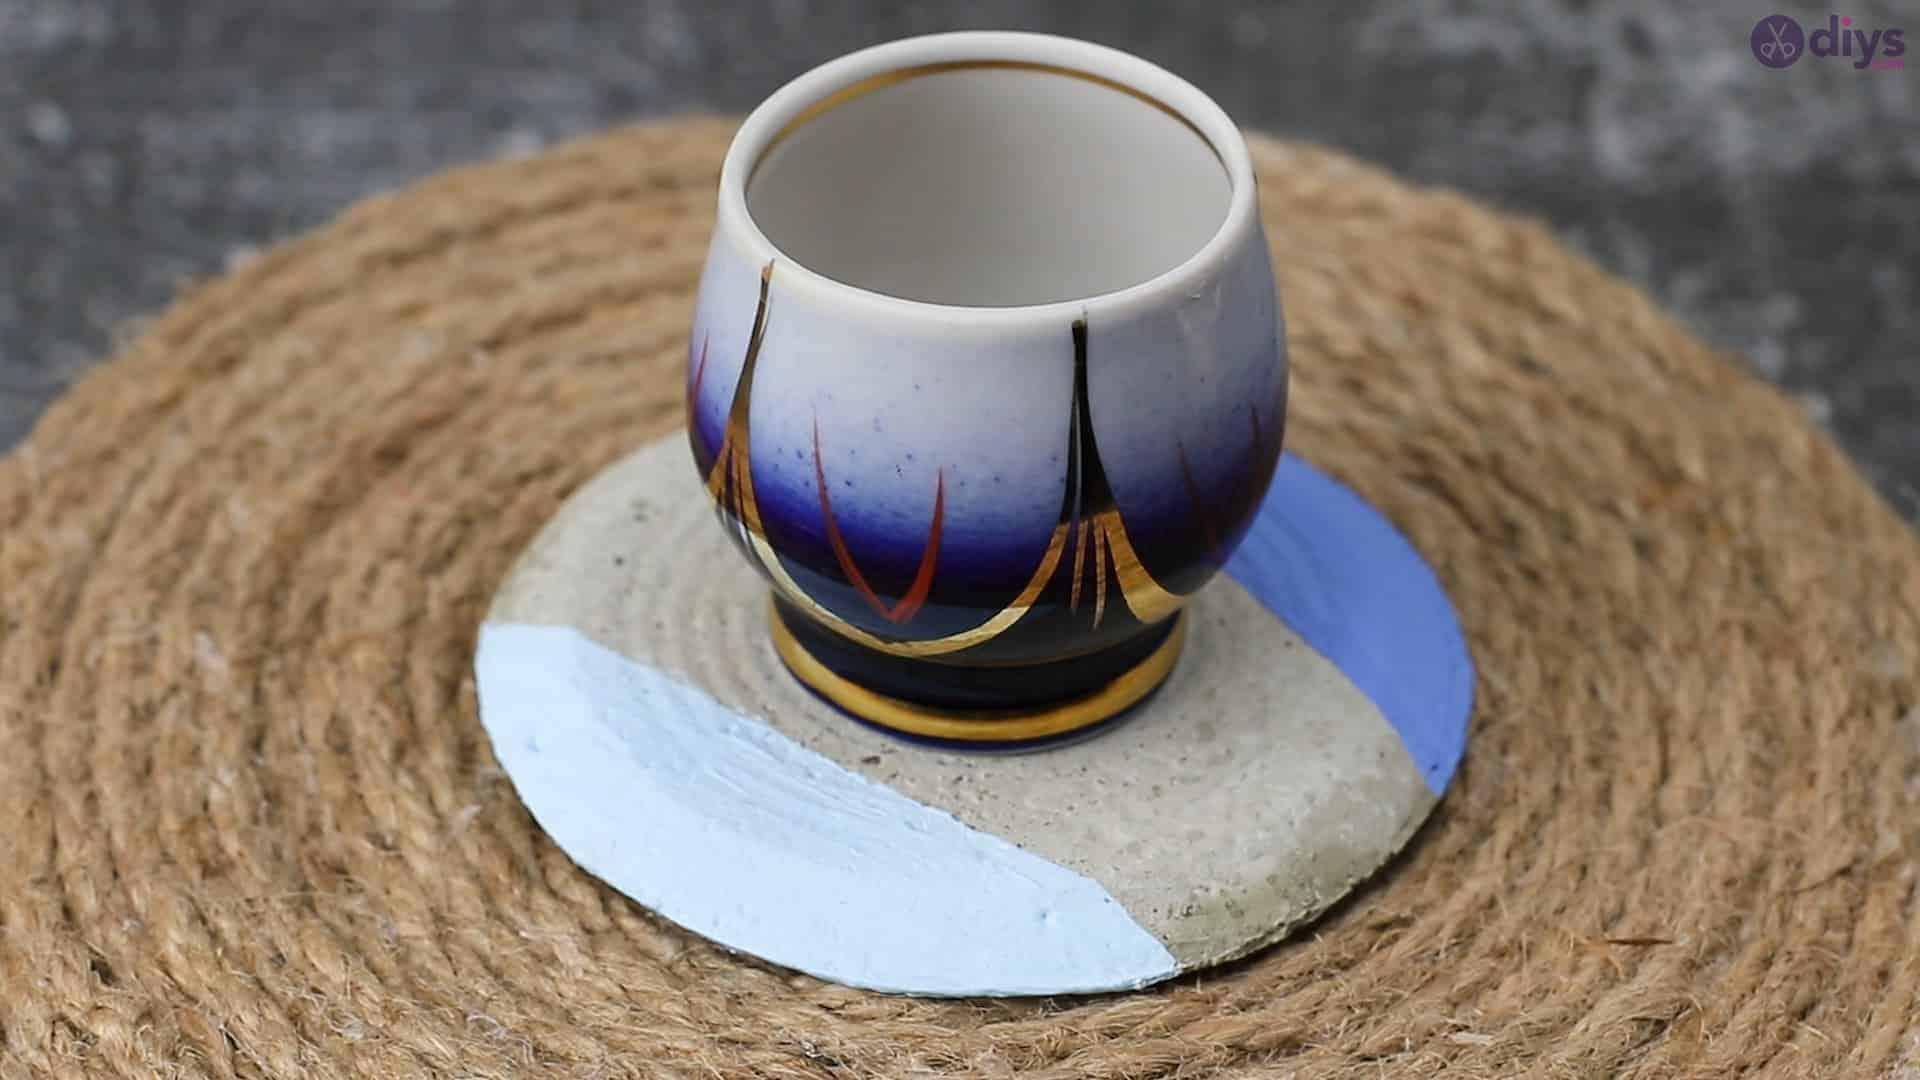 Diy concrete cup holder